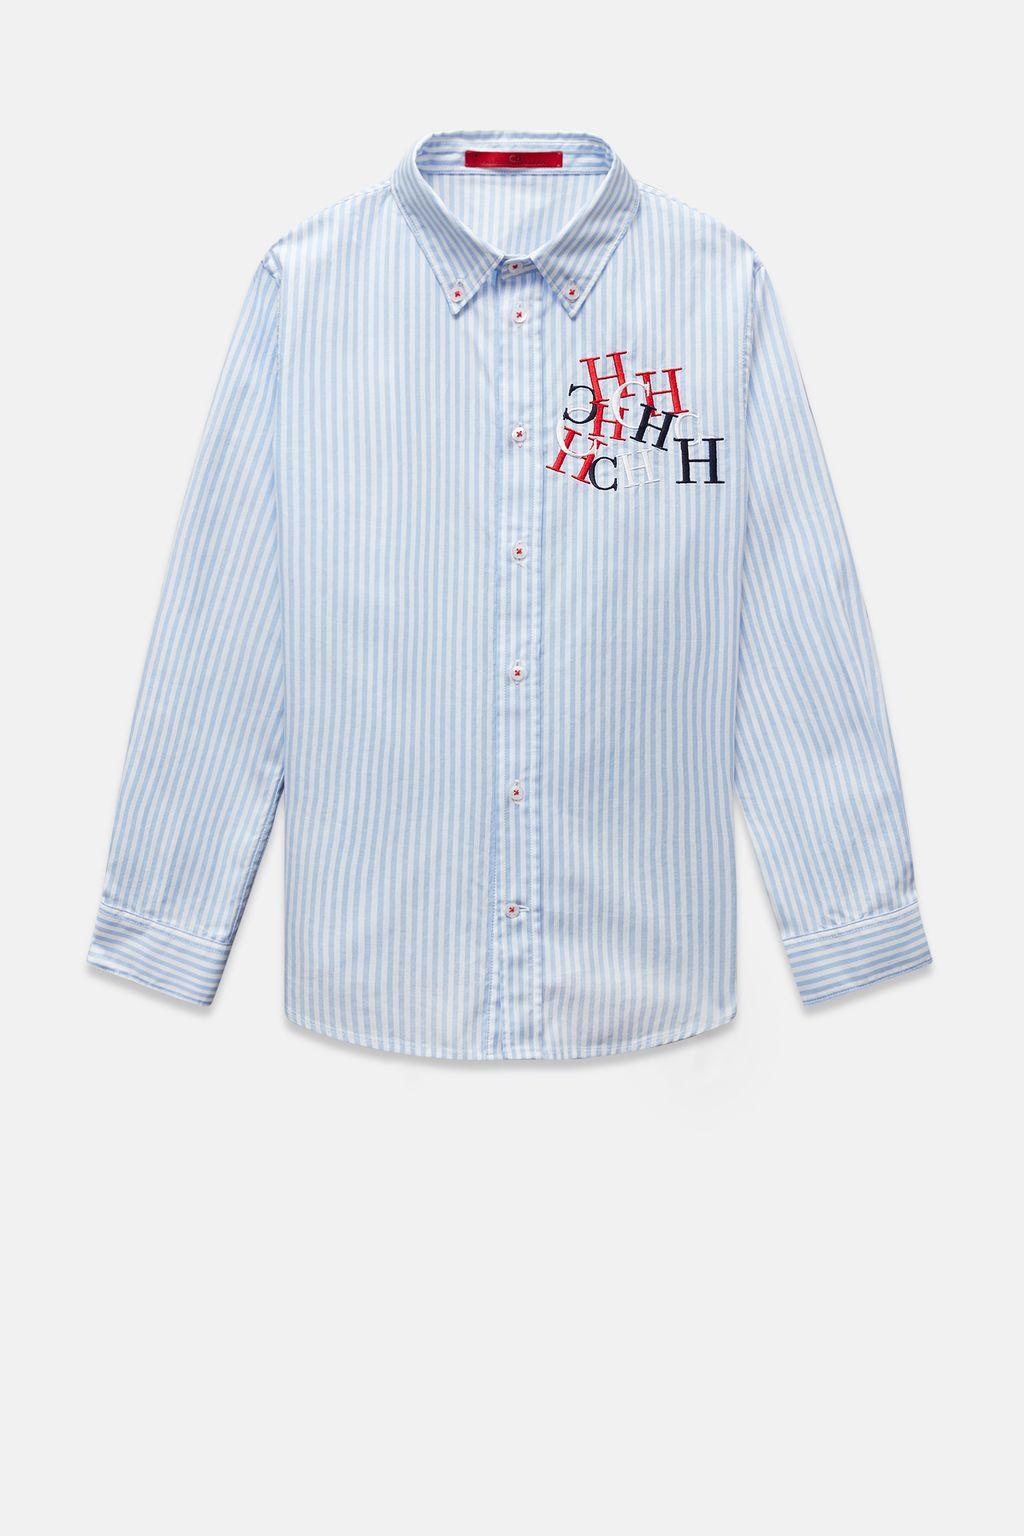 CH Swing oxford shirt